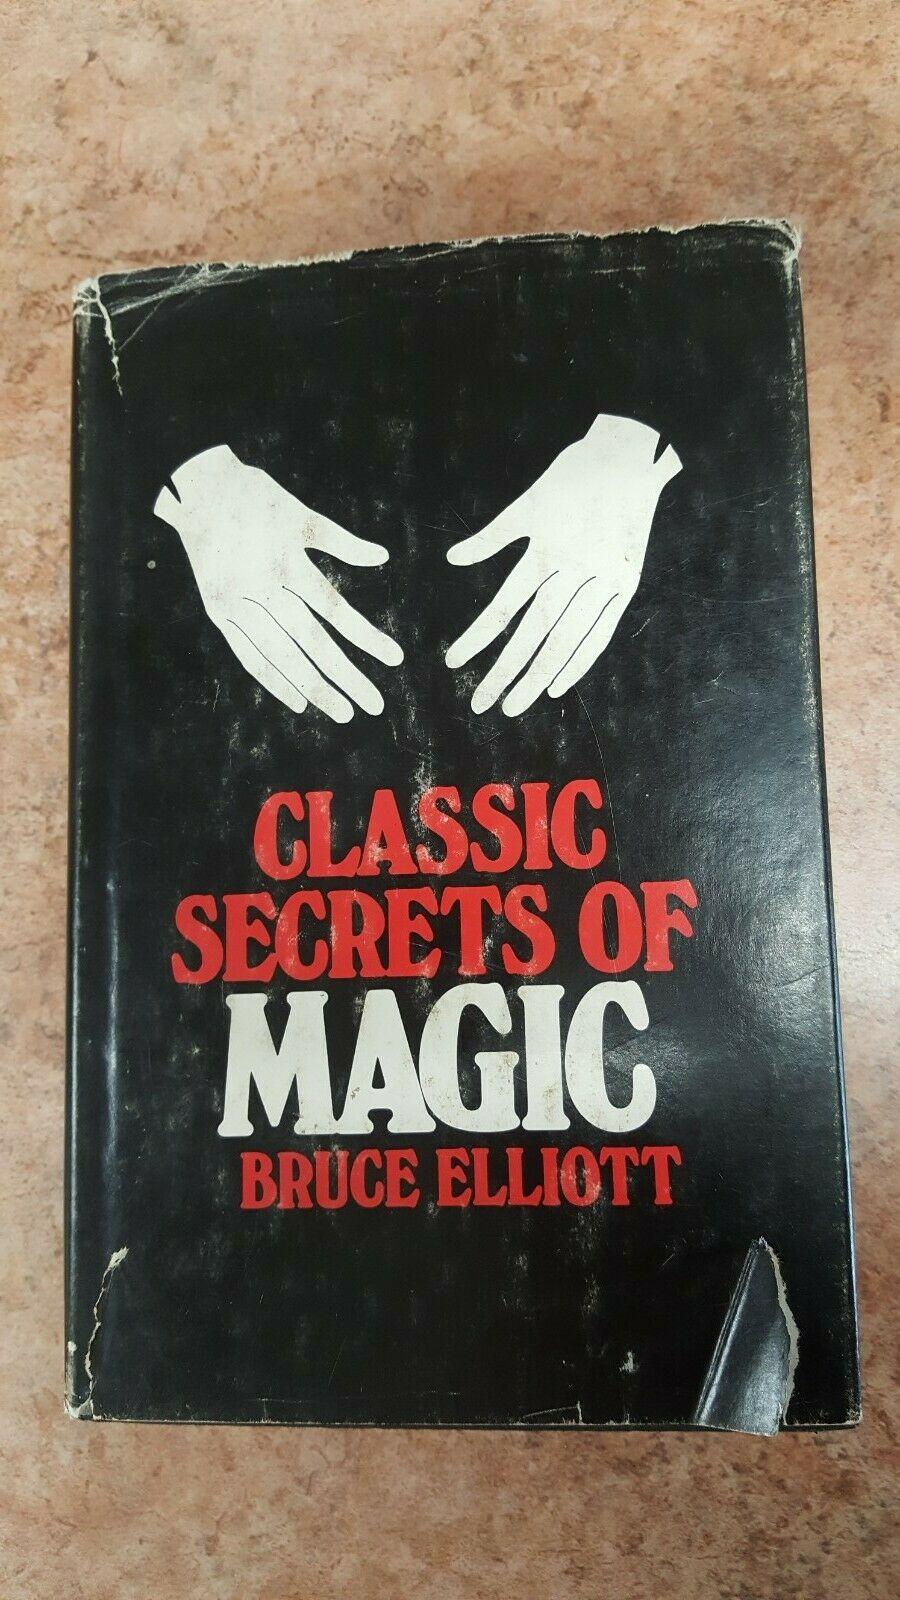 Classic Secrets of Magic, Bruce Elliot, 1953 First Edition